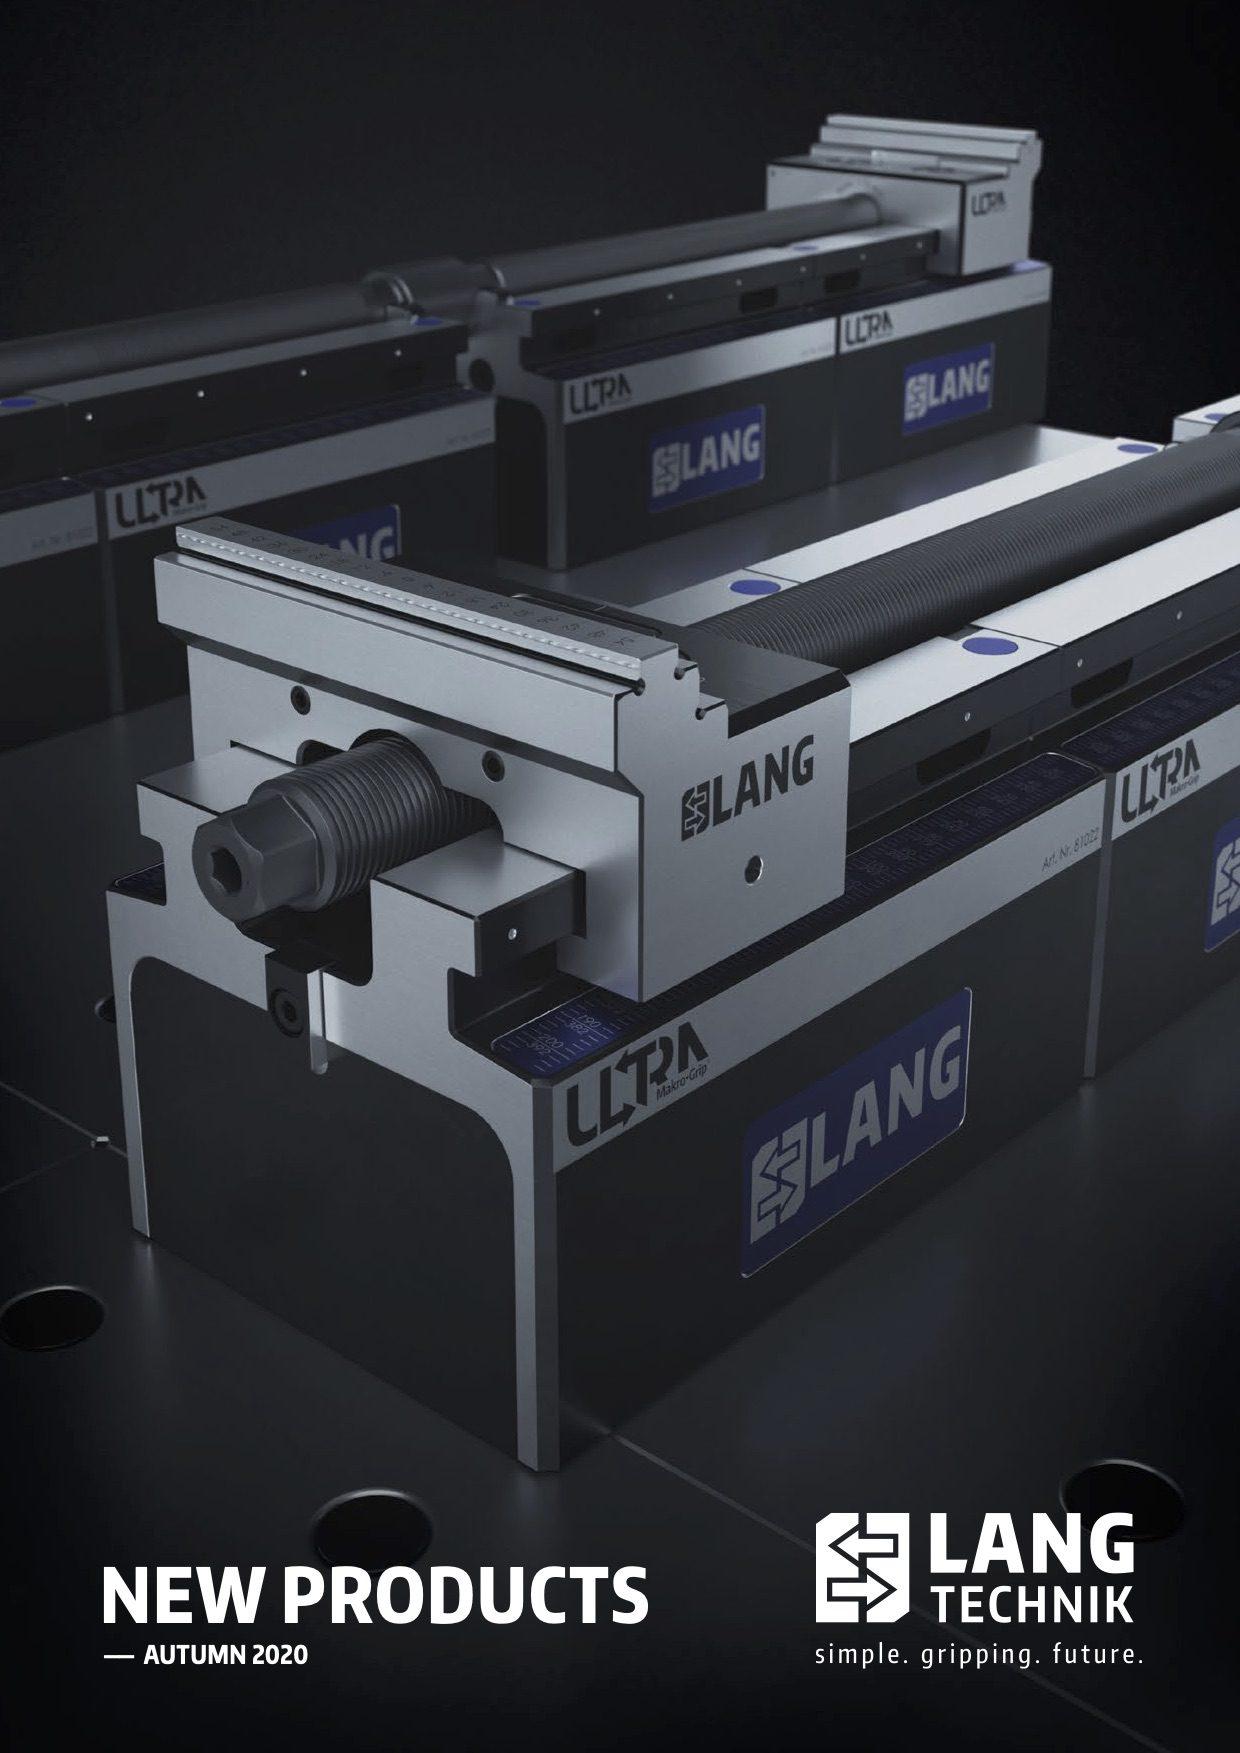 Lang Technik UK new products brochure